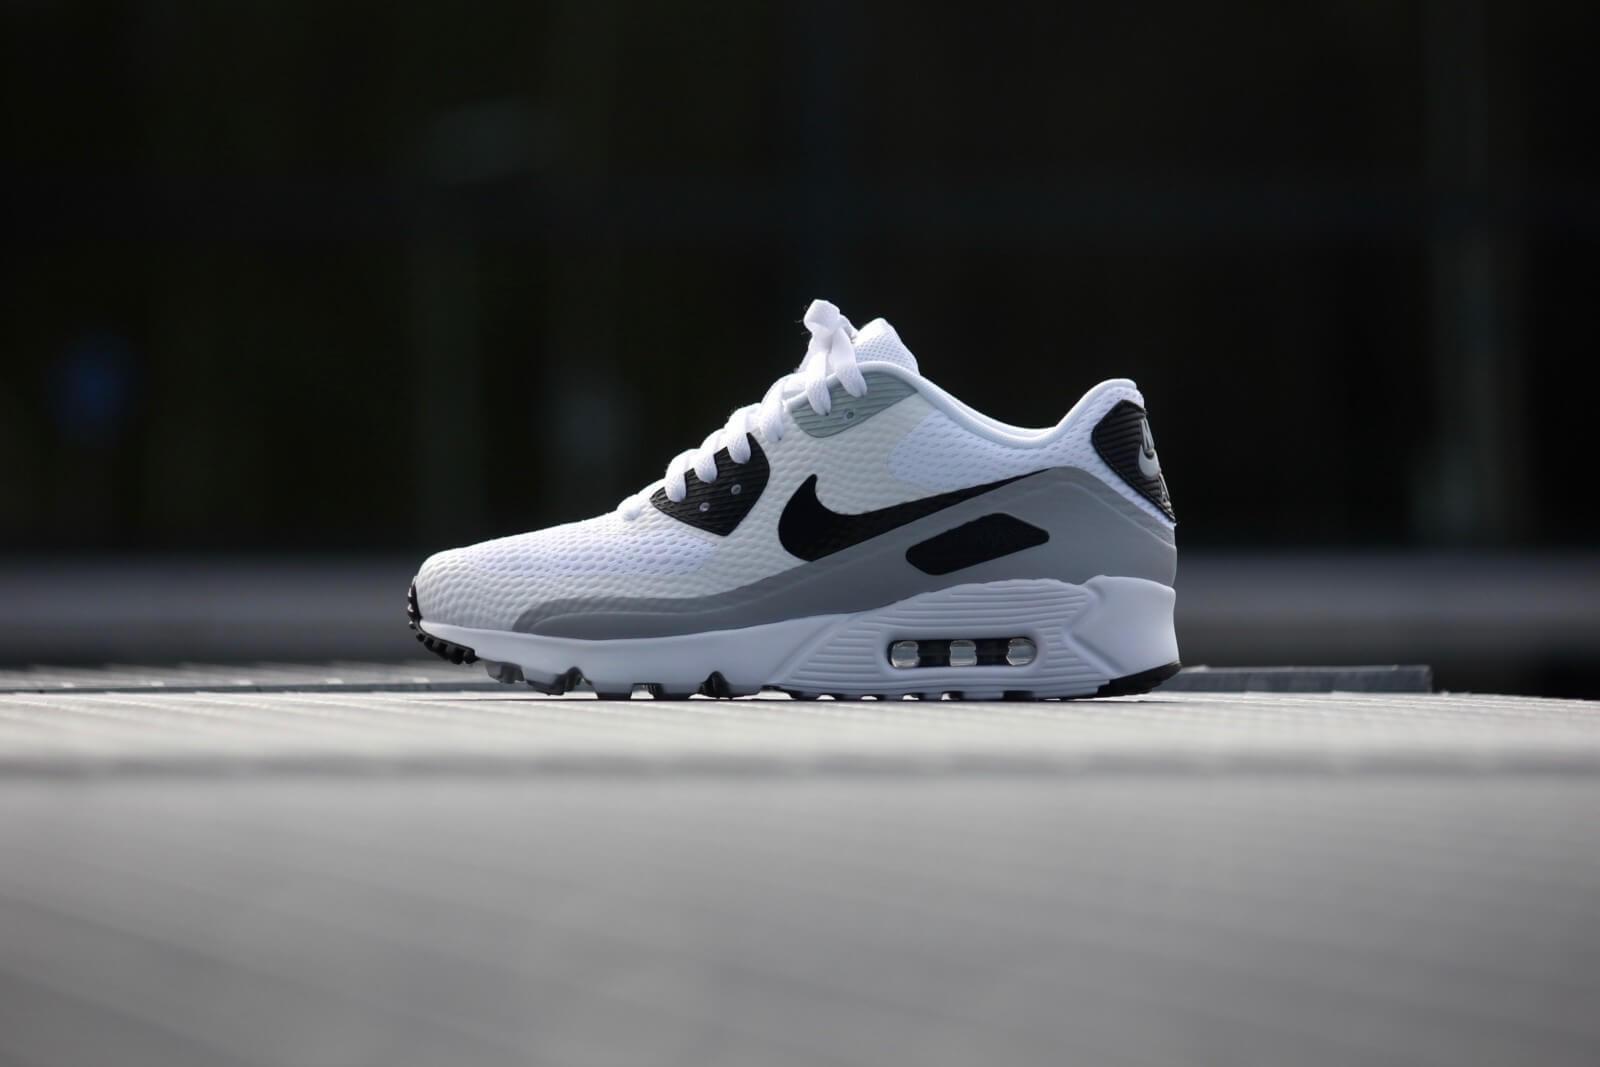 Nike Air max 90 Ultra Essential White/black-wolf grey